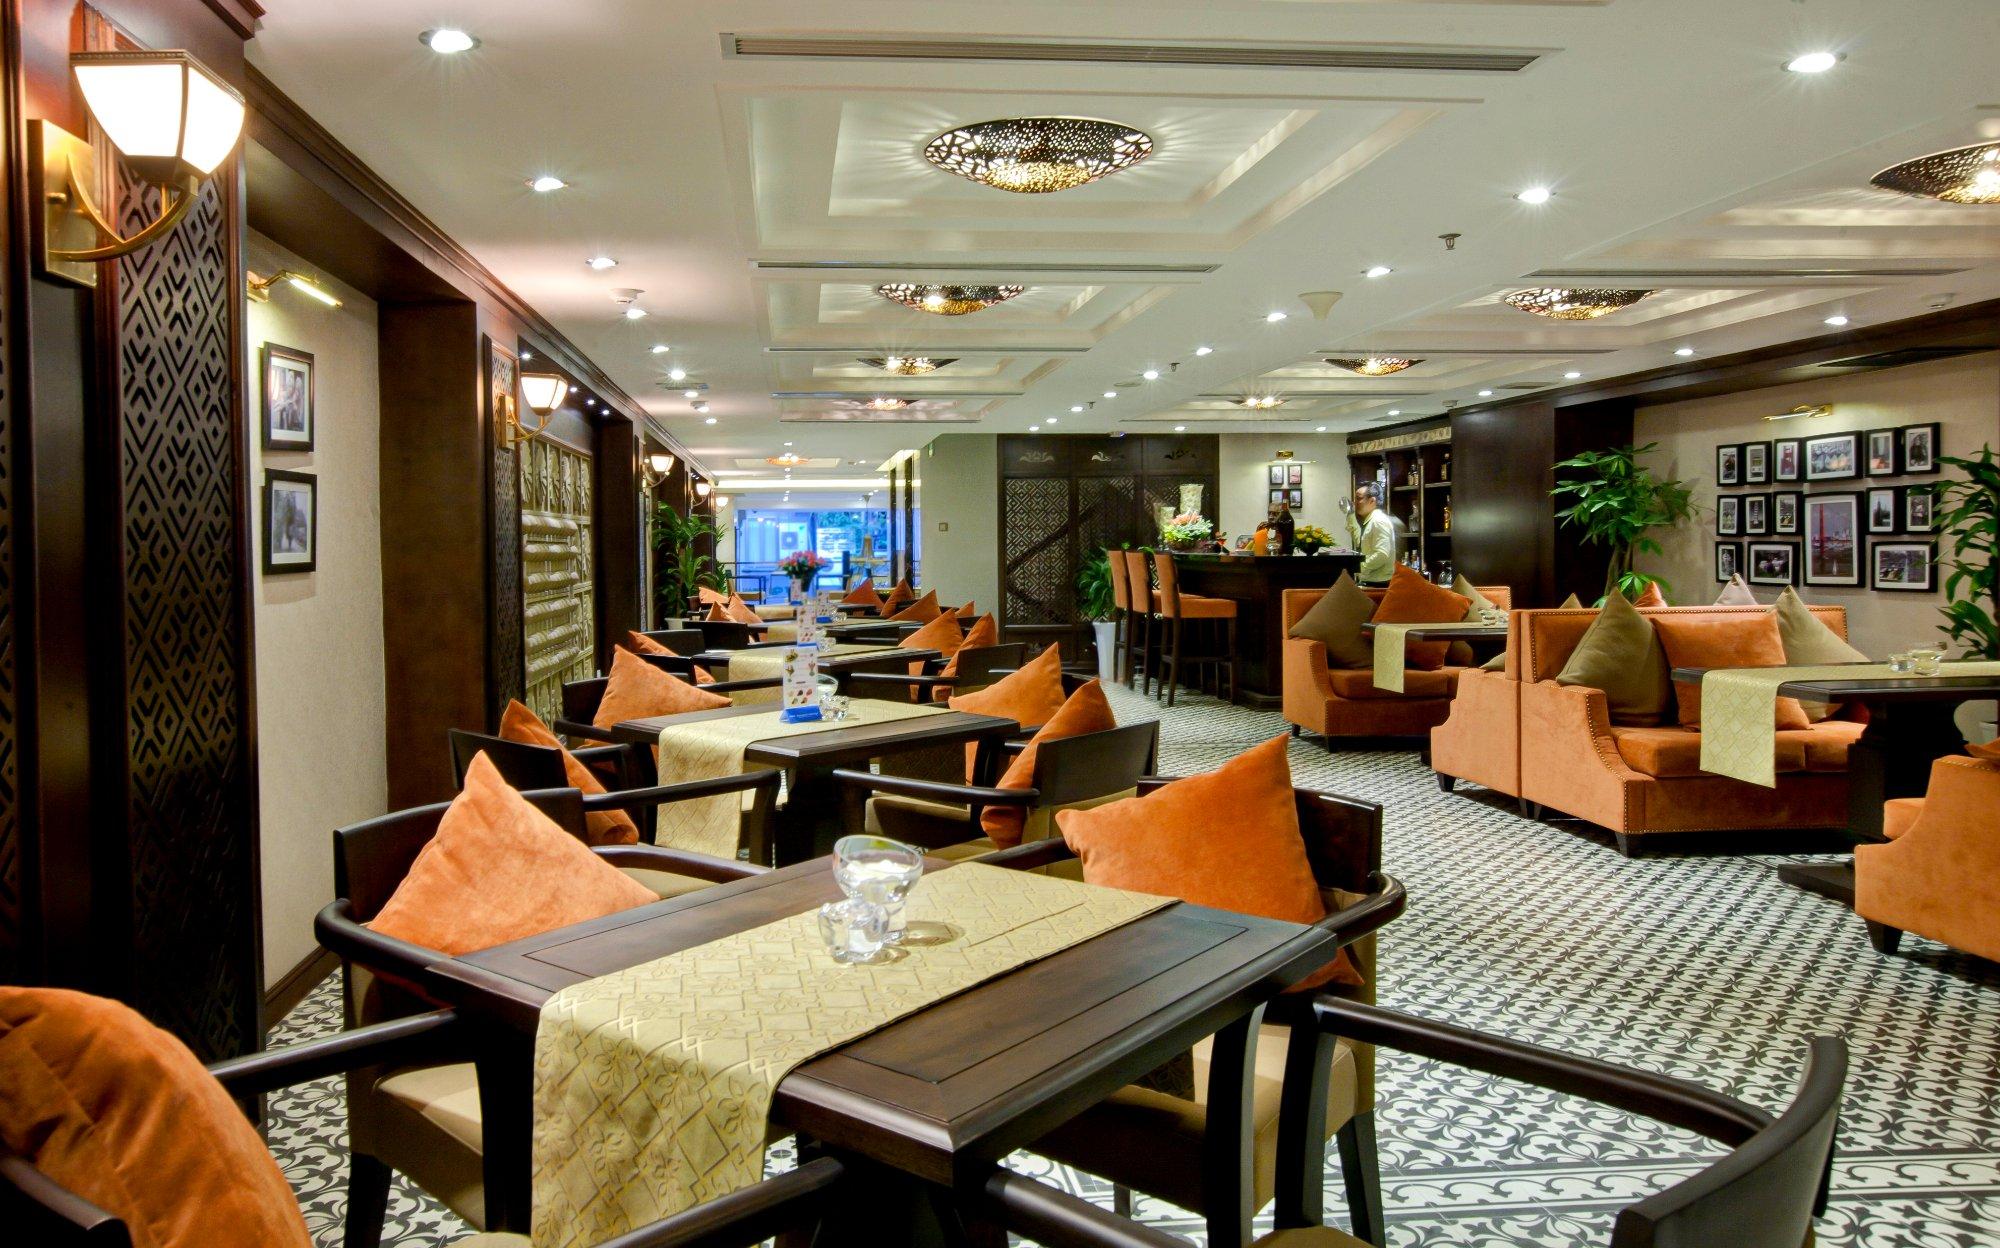 Golden Lotus Luxury Hotel